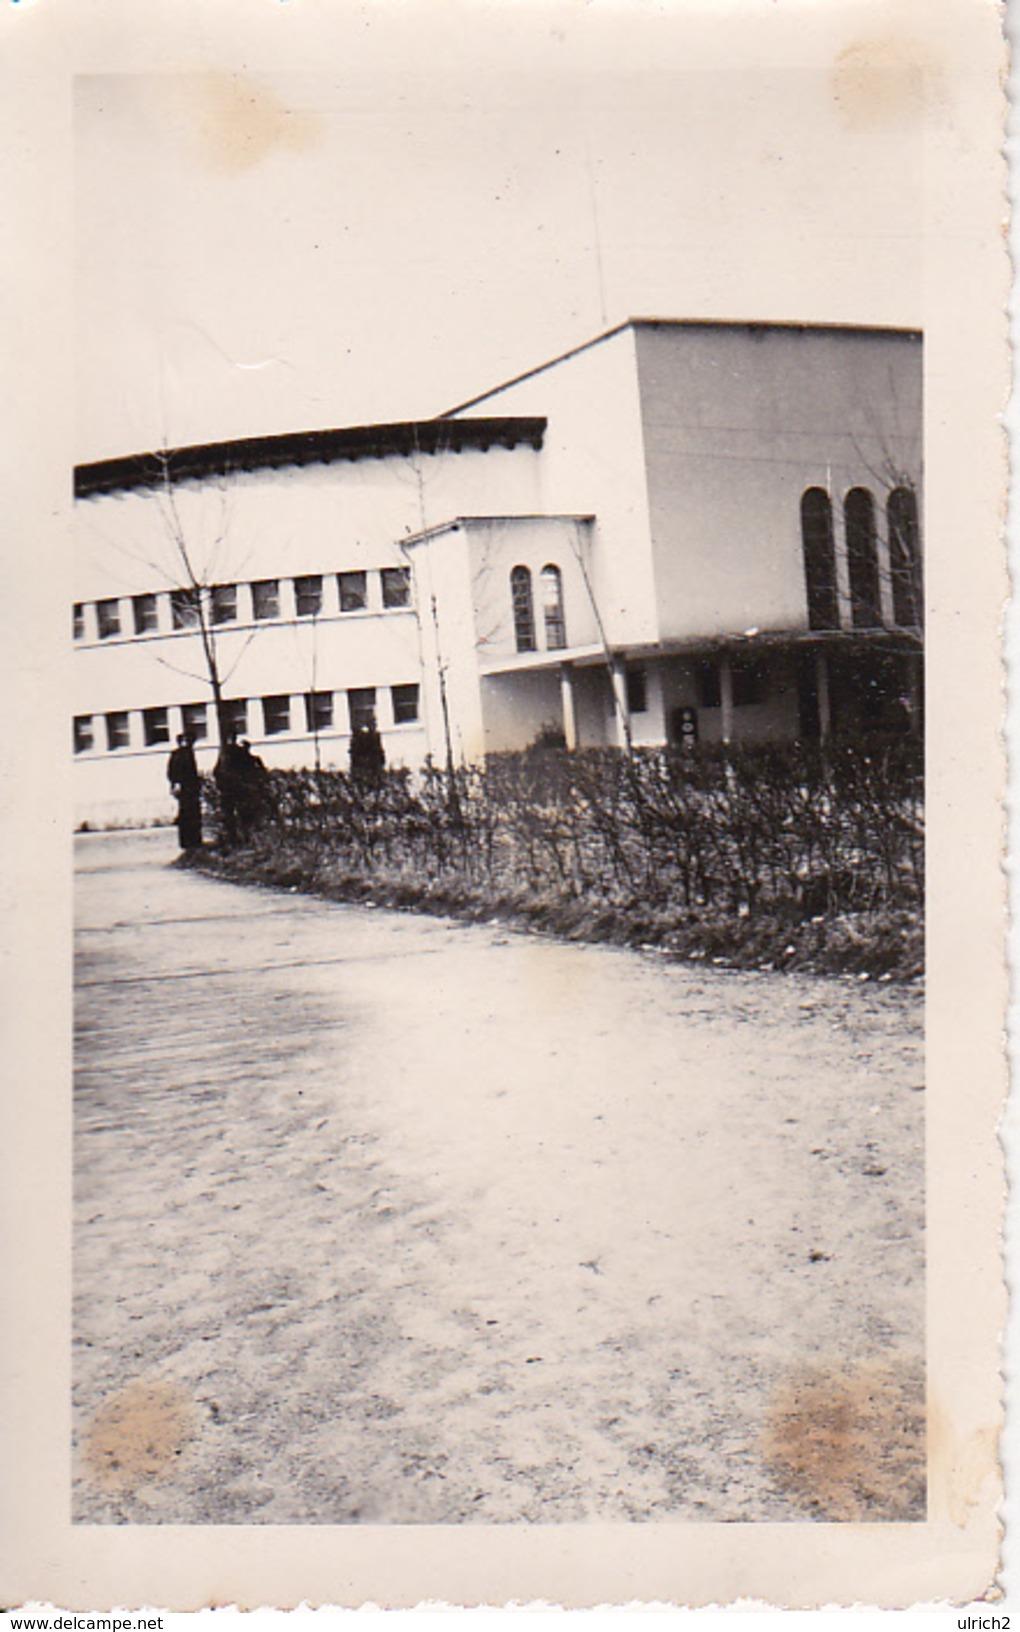 Foto Bulgarien - Gebäude (Kaserne?) -  Ca. 1940 - 10*6cm  (27614) - Orte